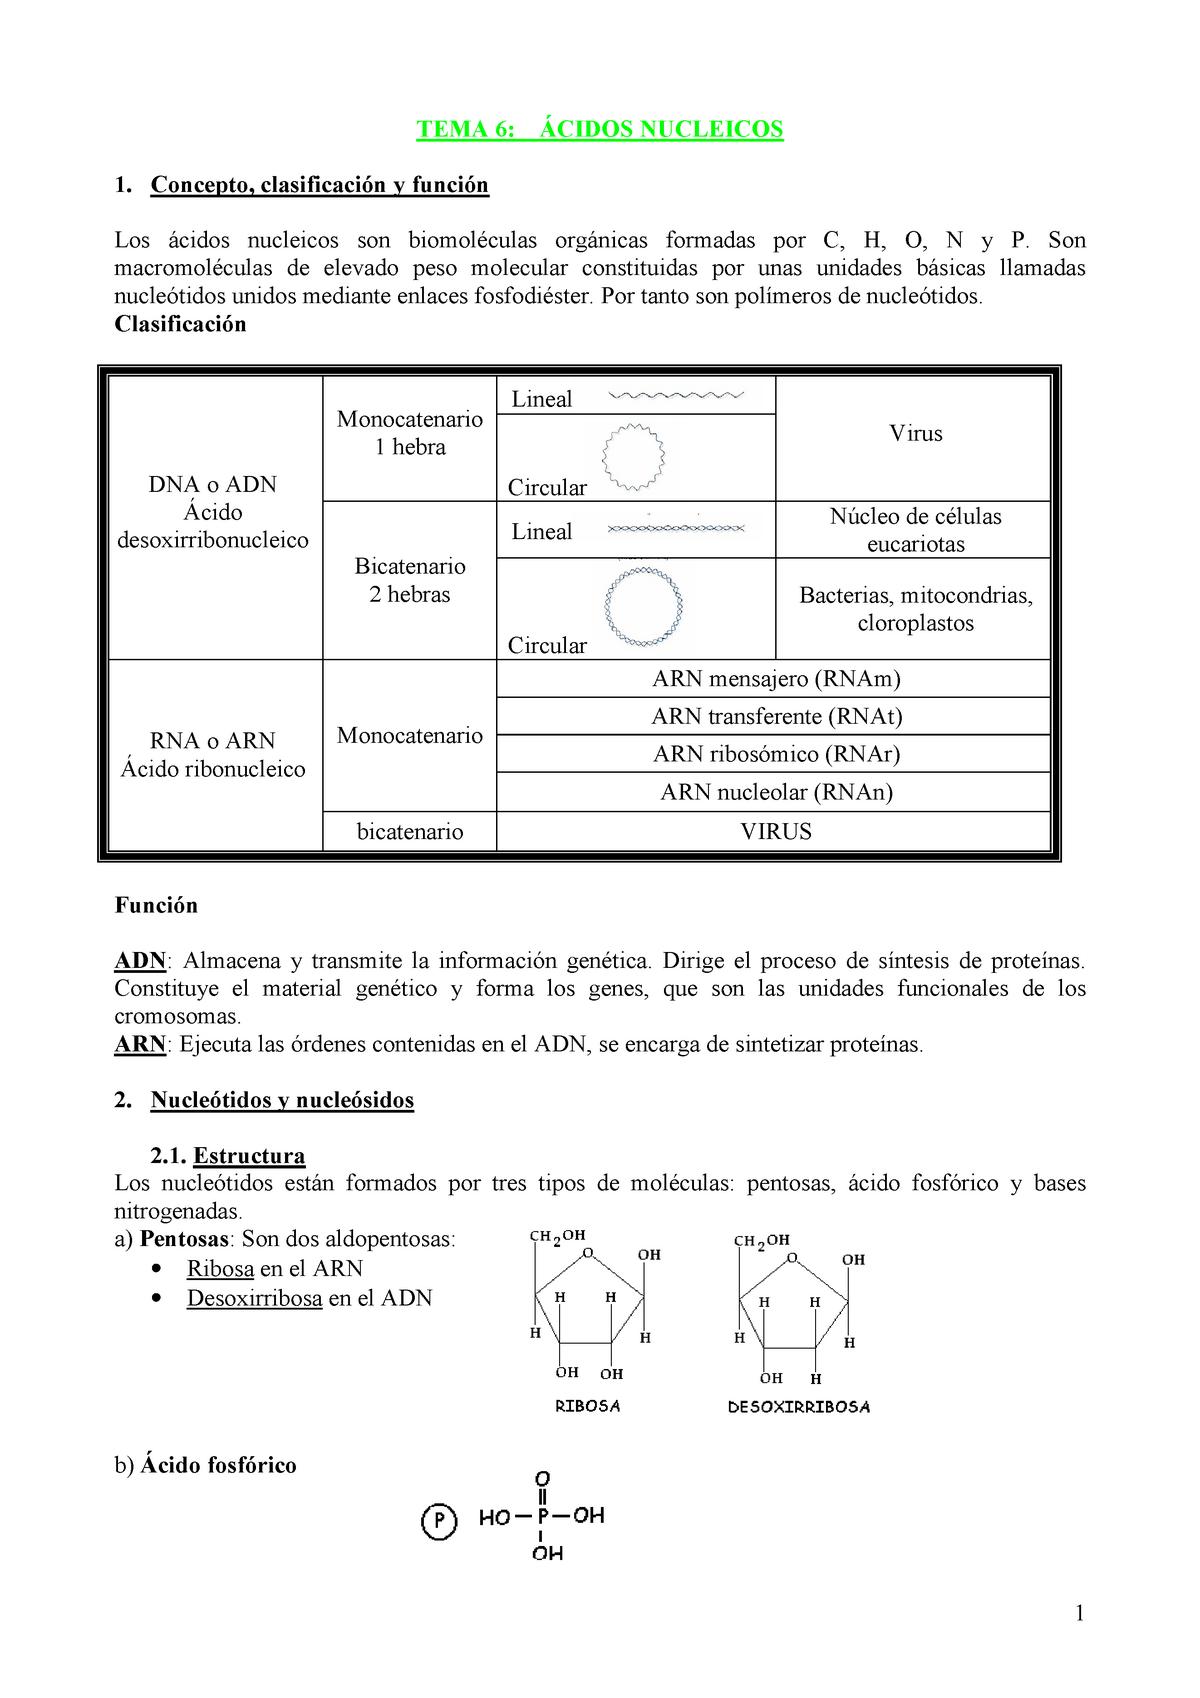 06 ácidos Nucleicos Química General 1029 Unlam Studocu